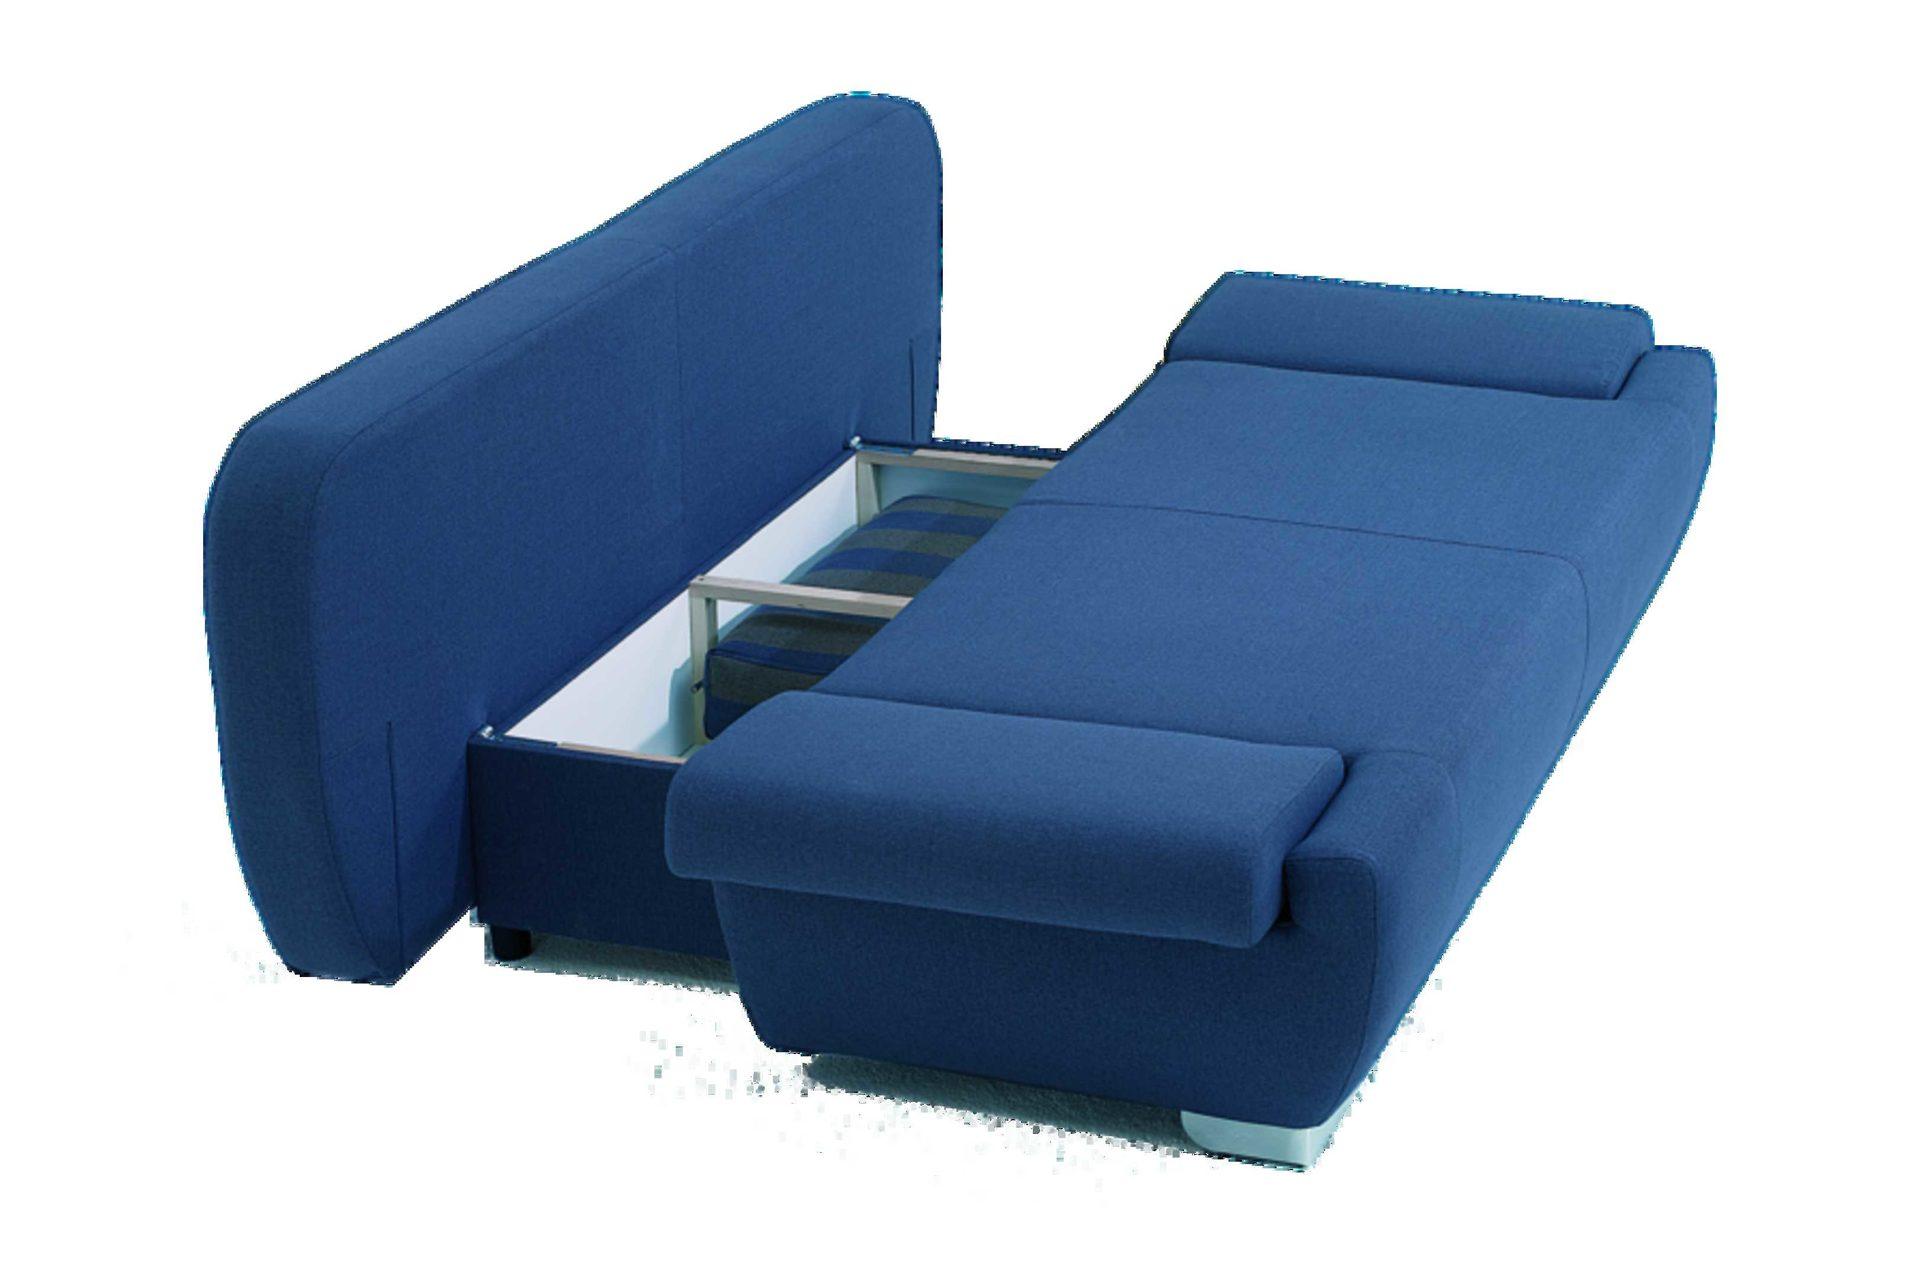 Schlafsofa jugendzimmer moebel  schlafsofa blau | Möbelideen